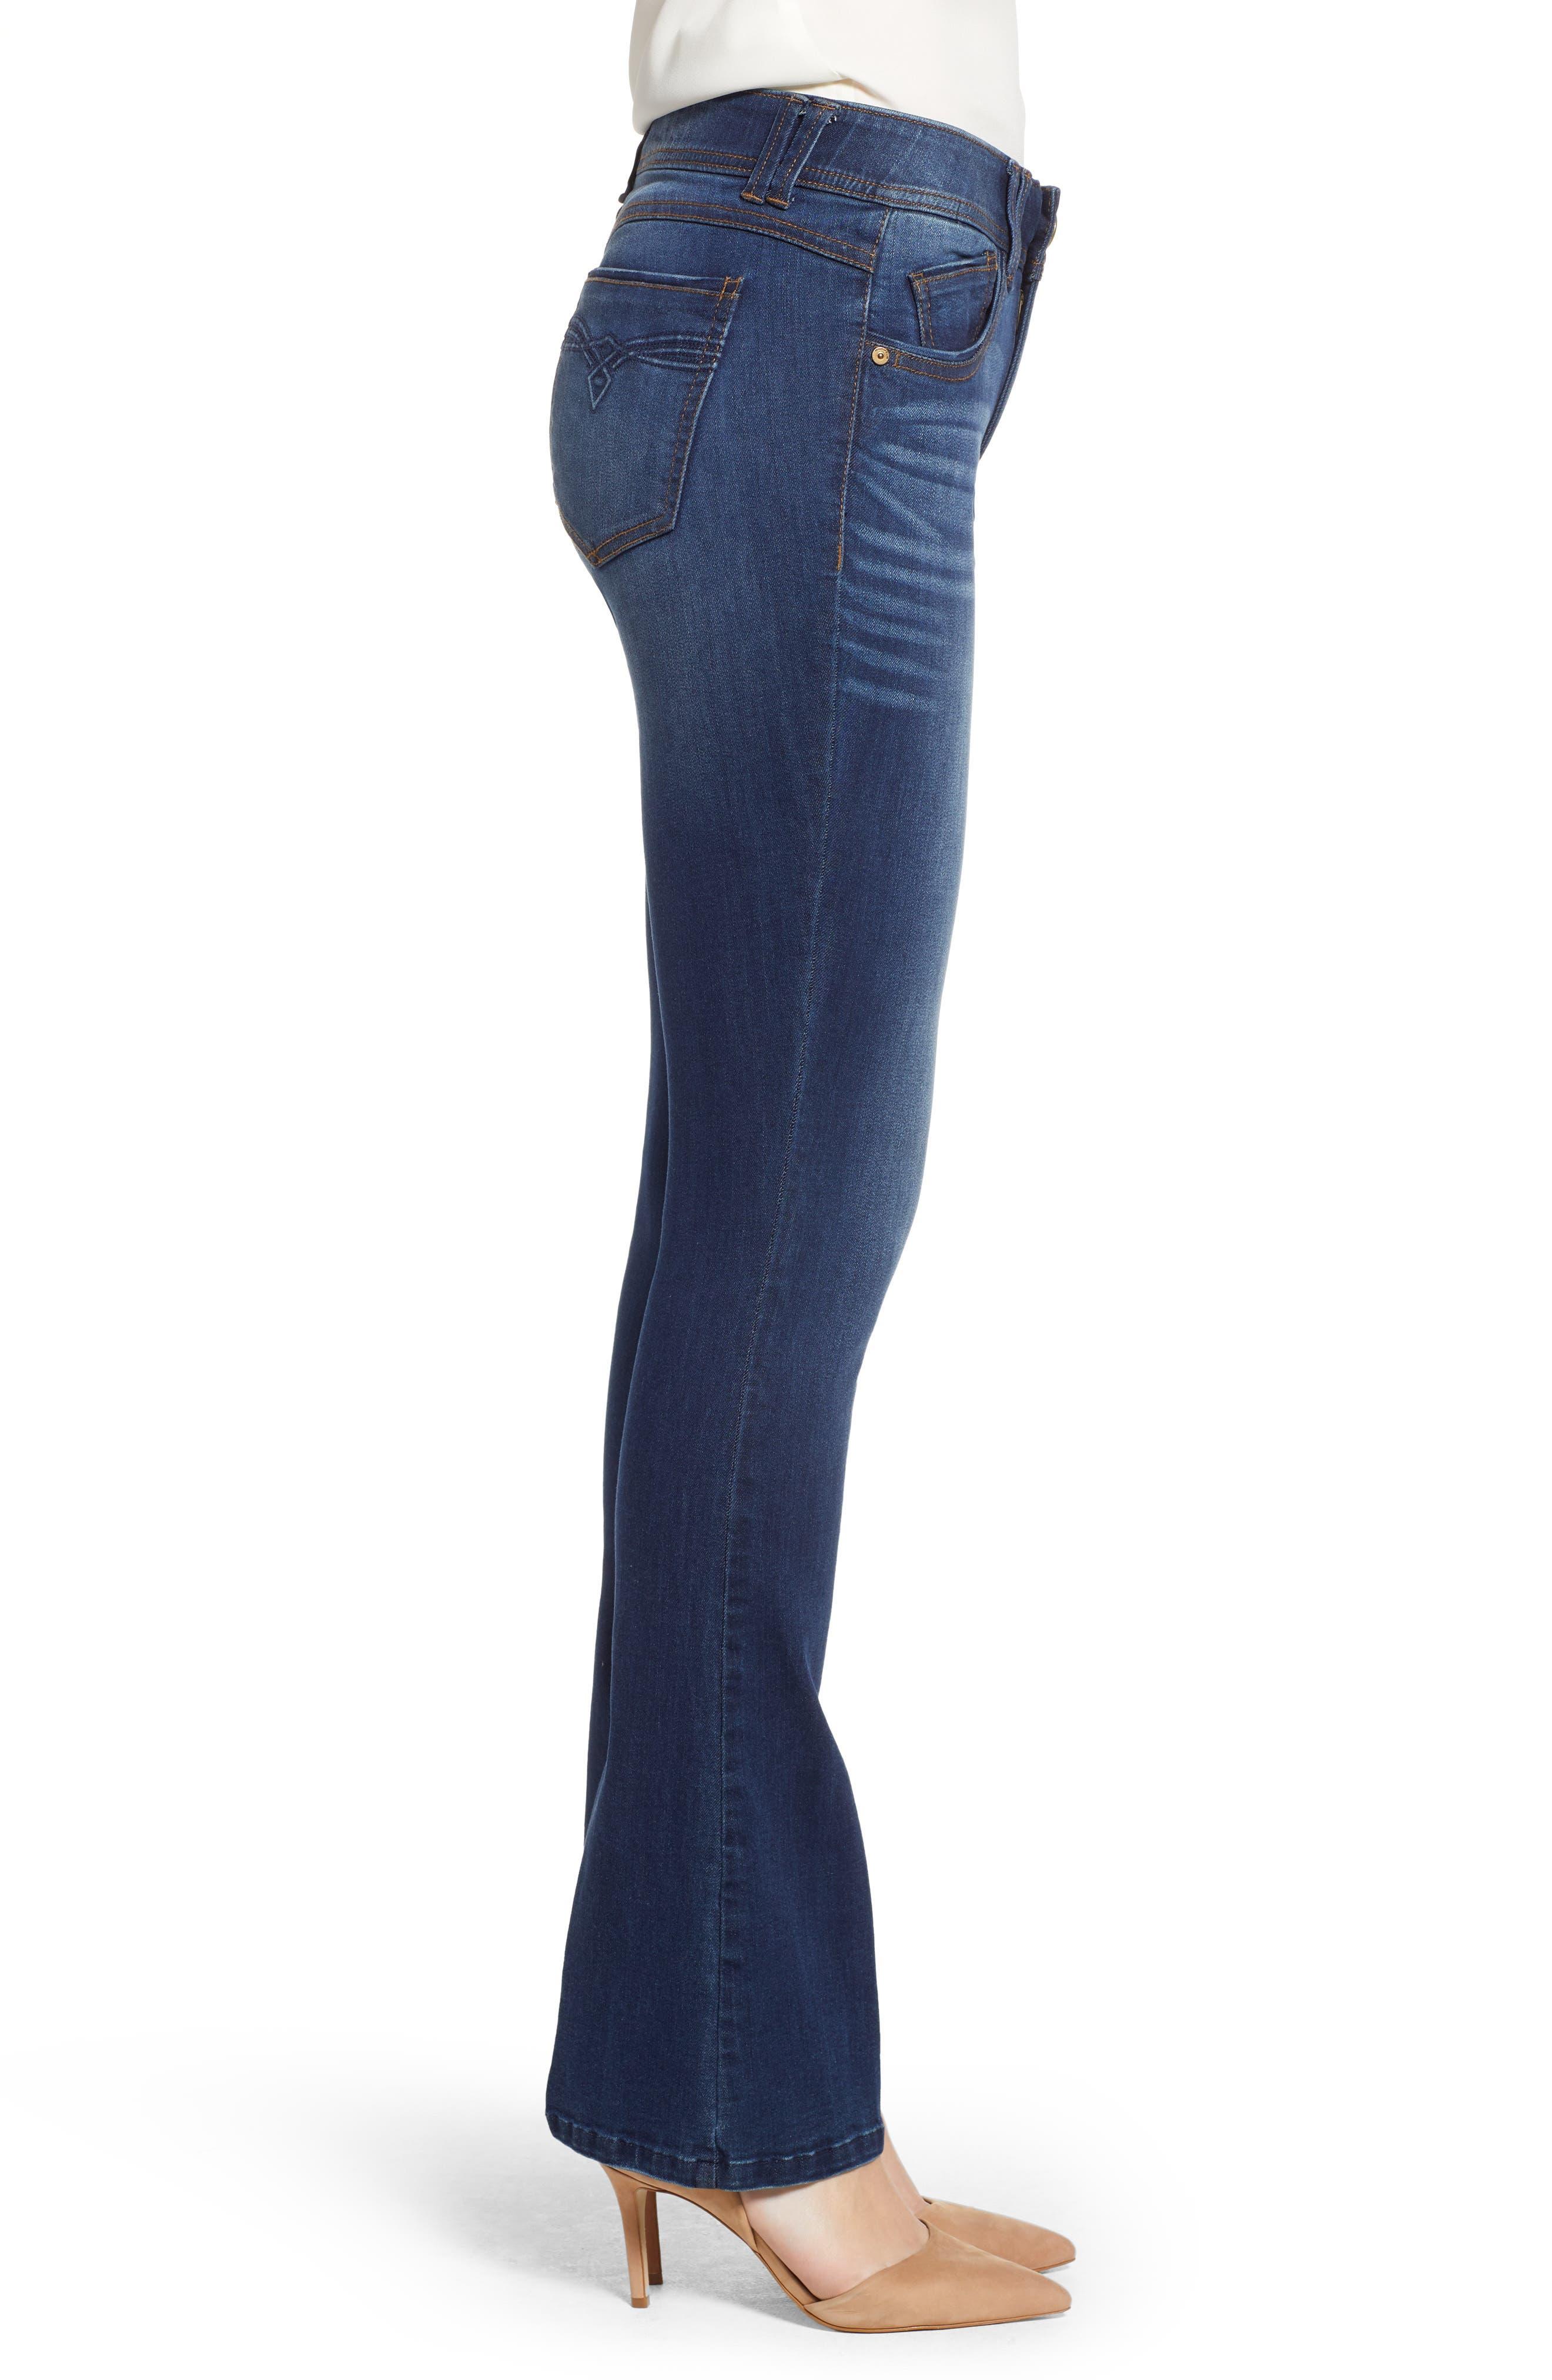 Ab-solution Luxe Touch Premium Jeans,                             Alternate thumbnail 3, color,                             420